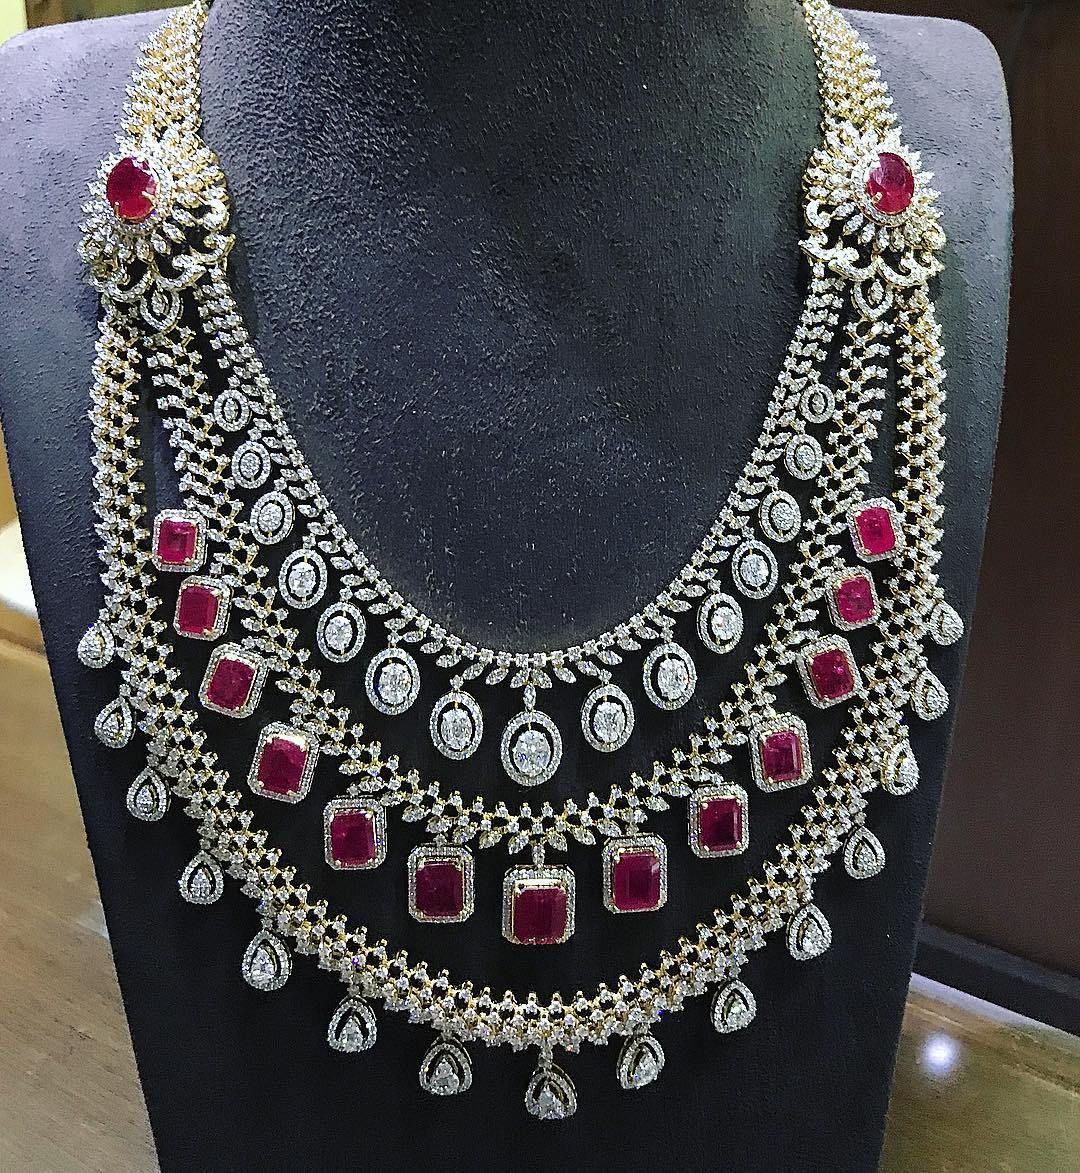 26 Breathtaking Heavy Diamond Necklace Set Designs South India Jewels Diamond Jewelry Set Diamond Necklace Set Real Diamond Necklace